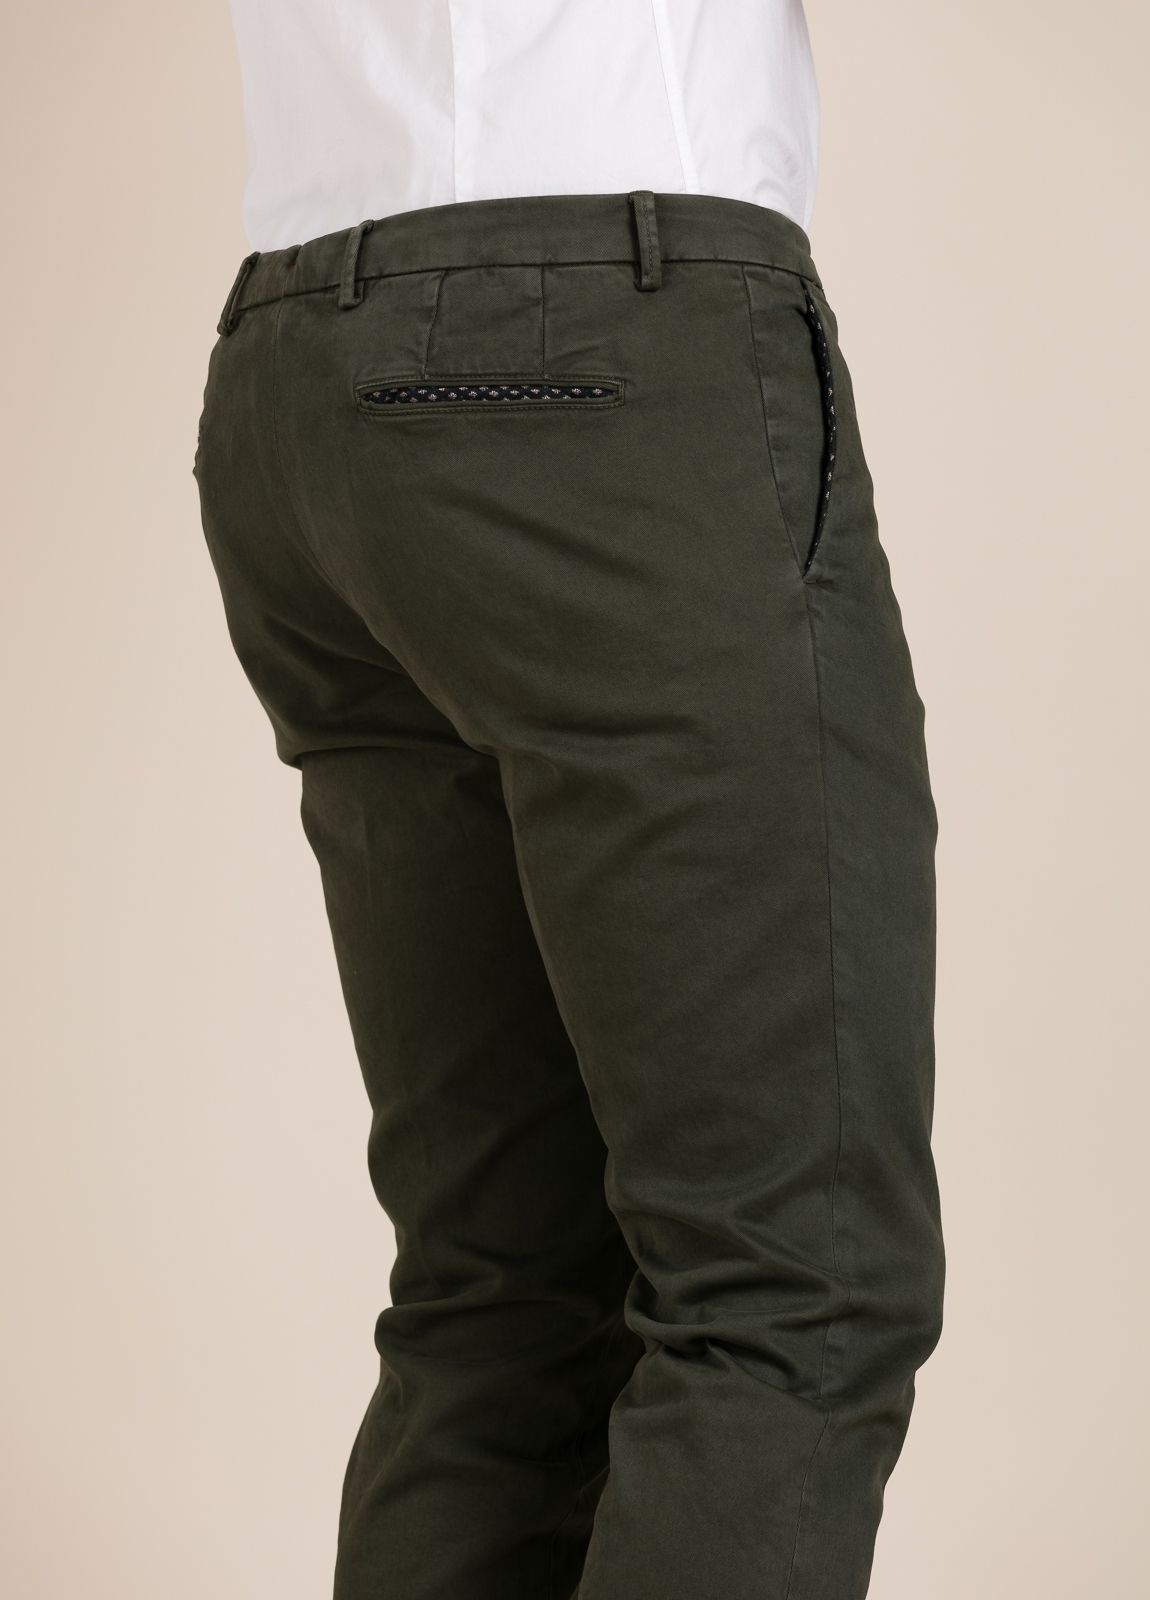 Pantalón chino PAOLONI verde kaki. - Ítem3